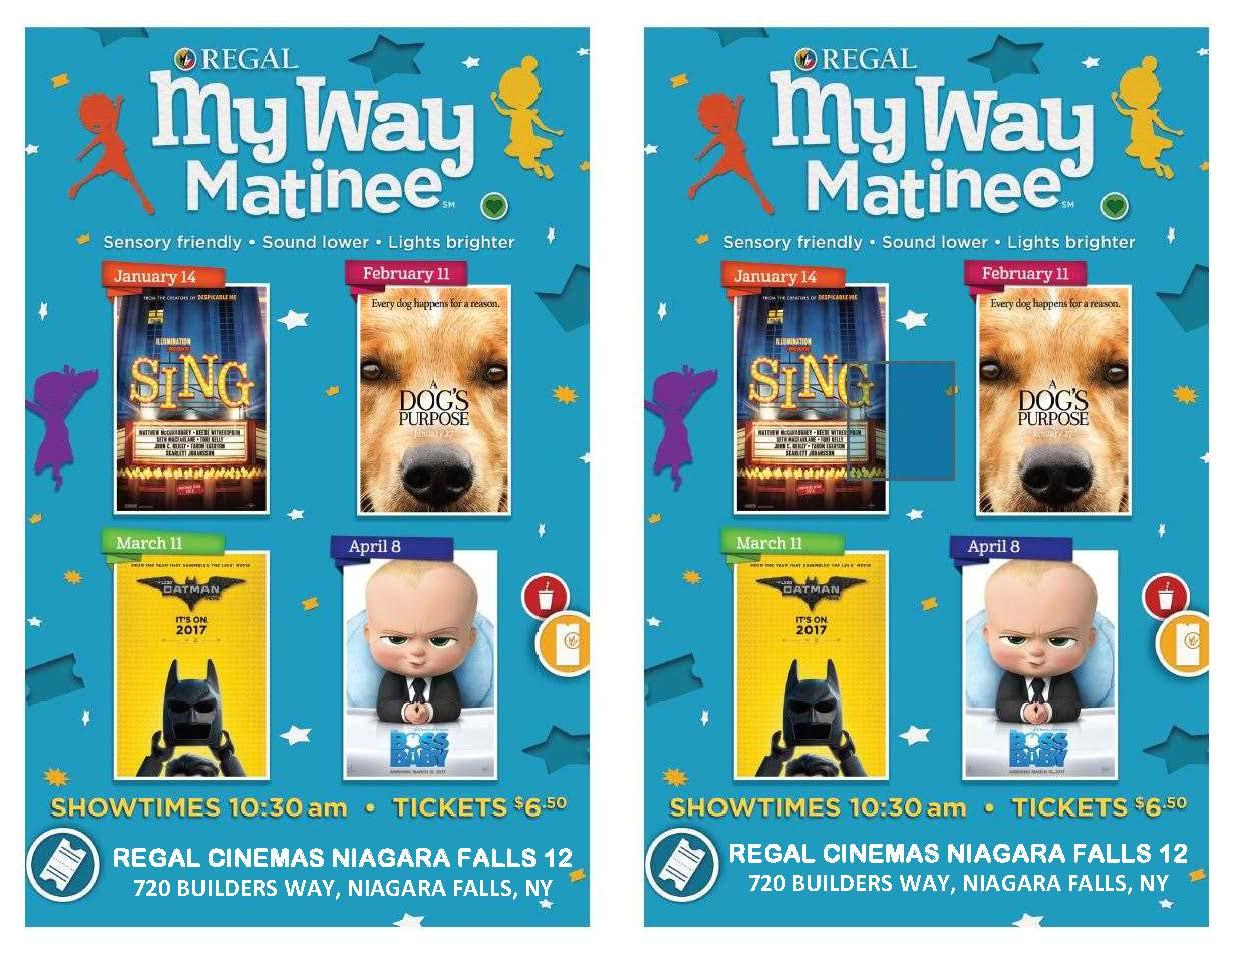 Movies My Way 2017